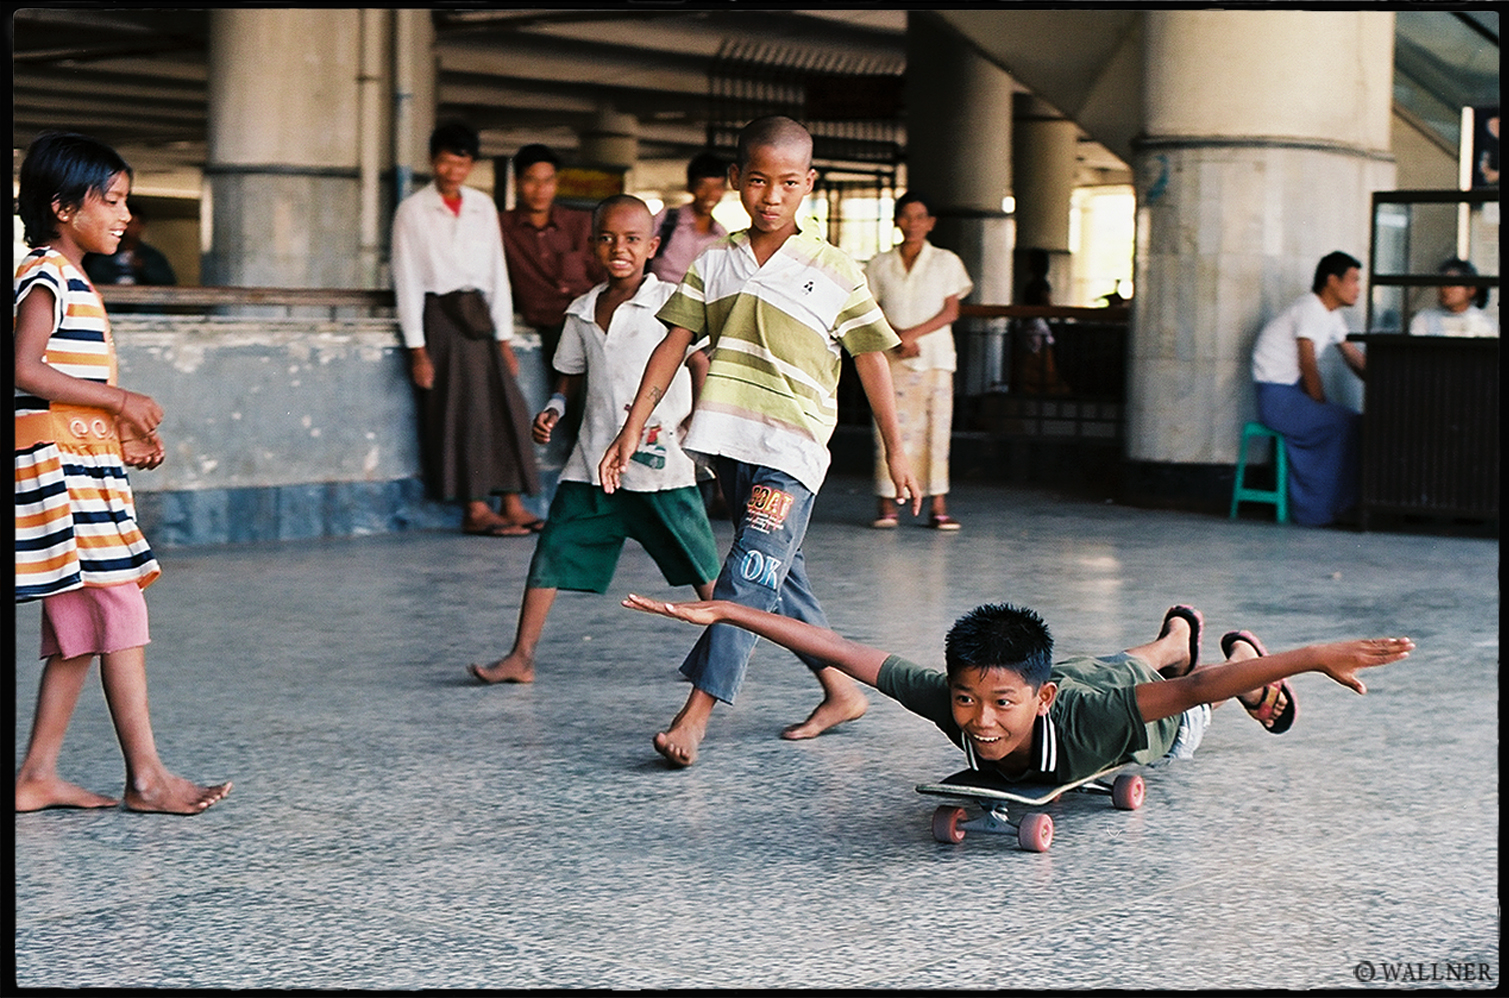 35mmPatrikWallner_Mandalay_SkateboardIntroductionToLife2LOWQ